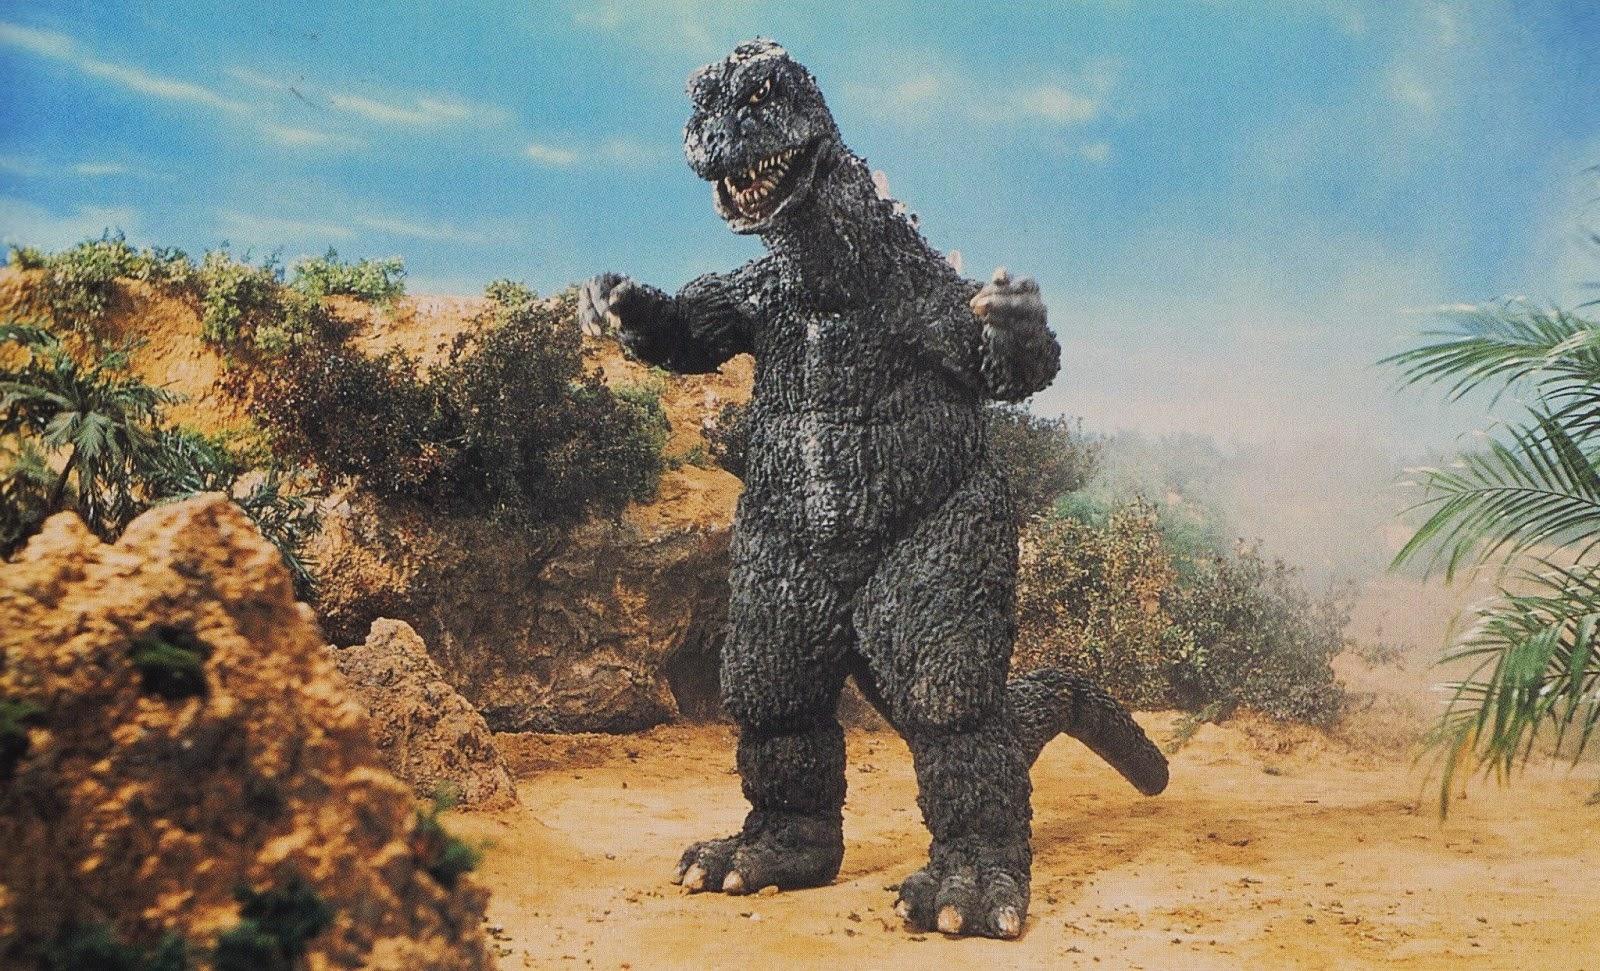 Favorite Godzilla design - Godzilla Has Return - Fimfiction